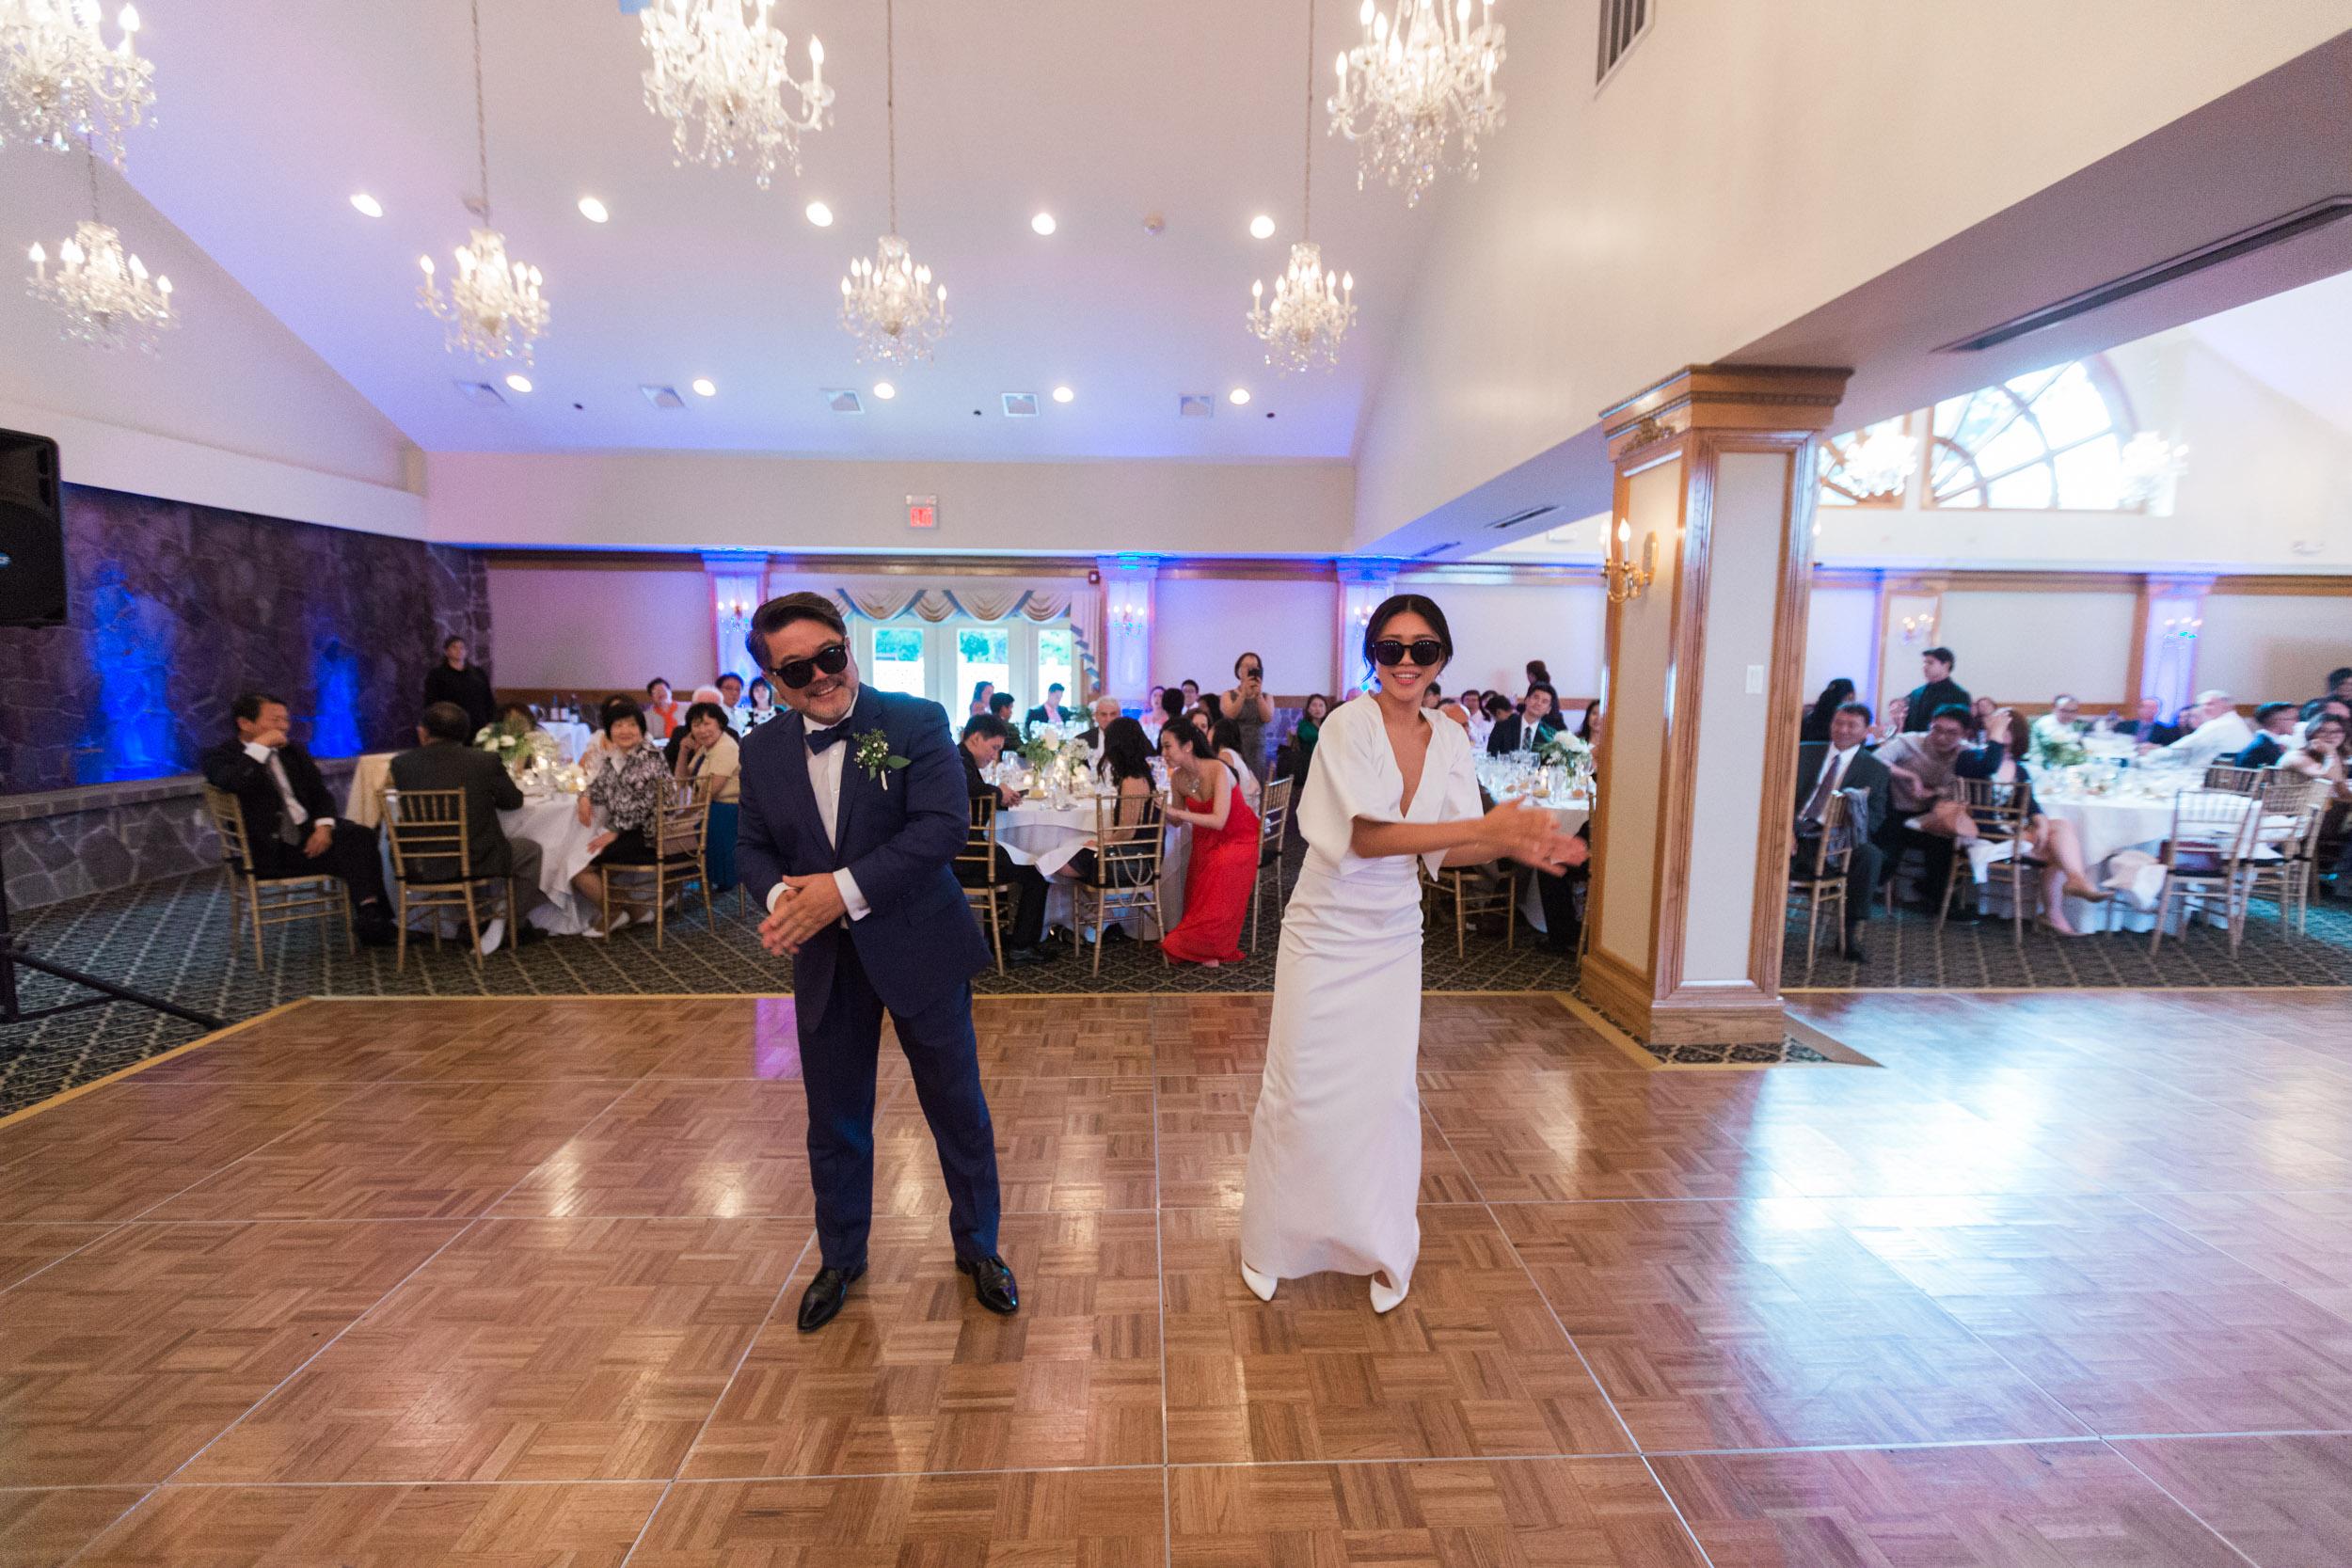 jean-arnold-wedding-0044.jpg